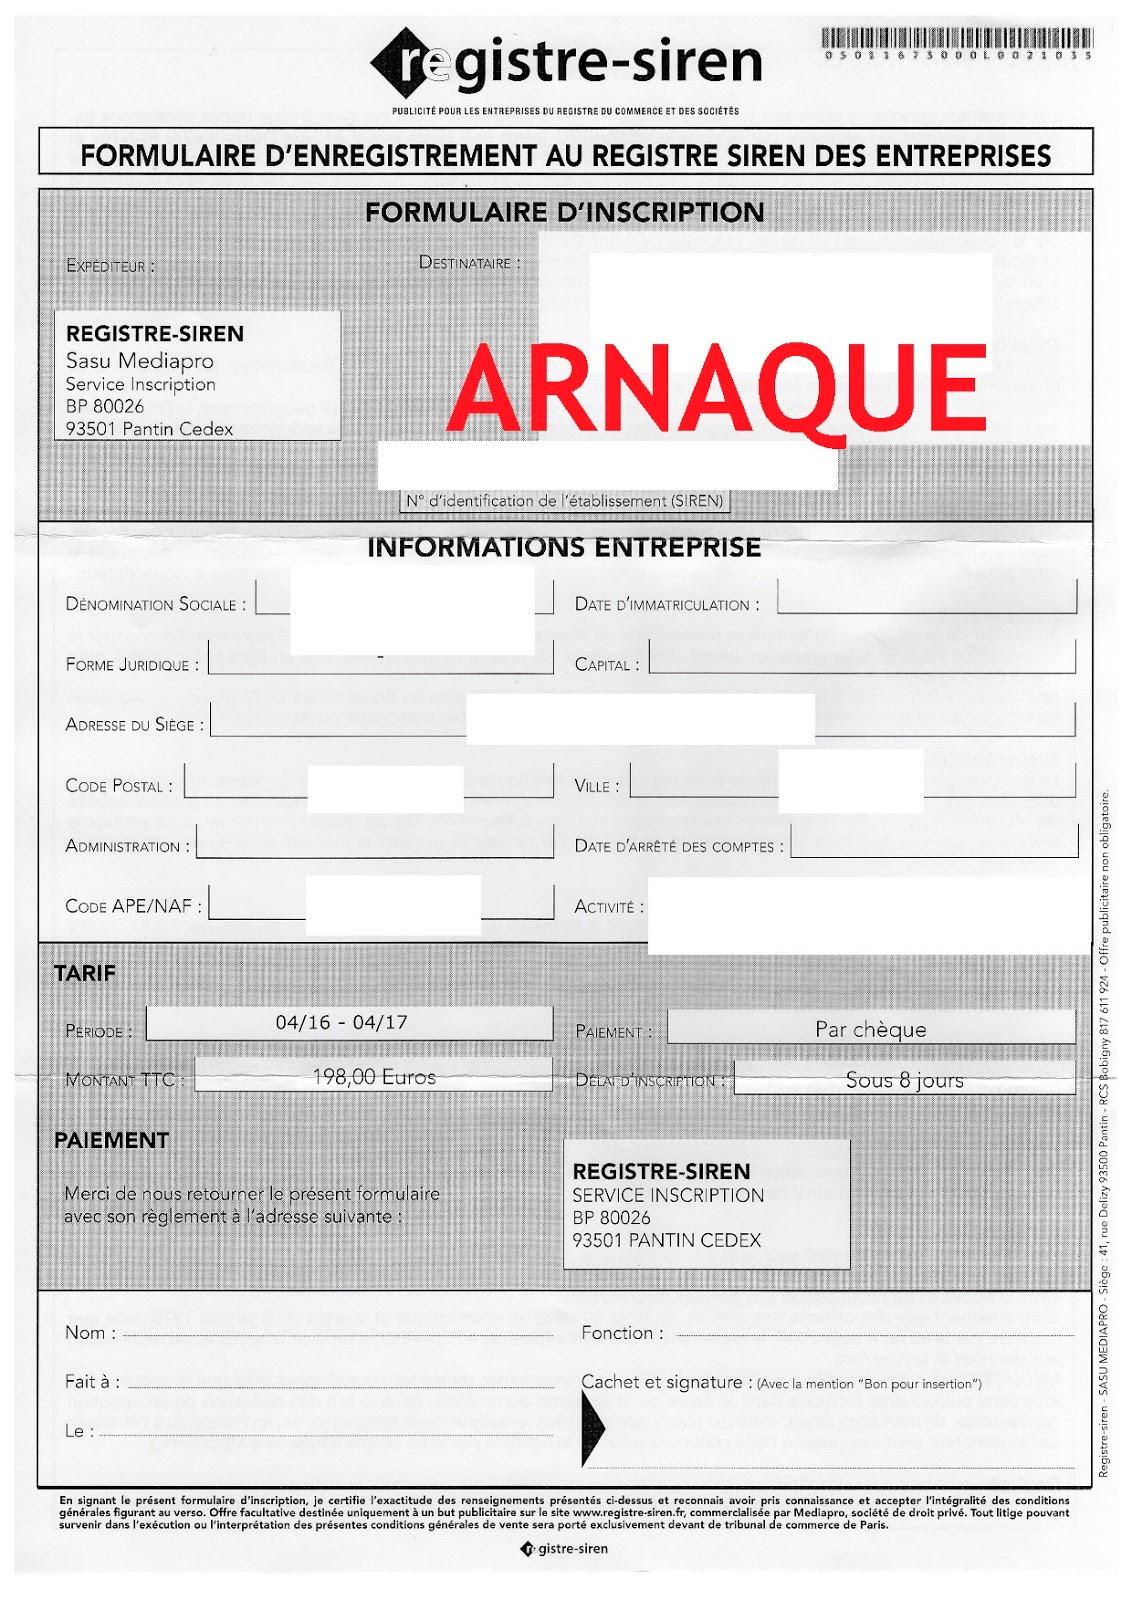 arnaques entrepreneurs  registre